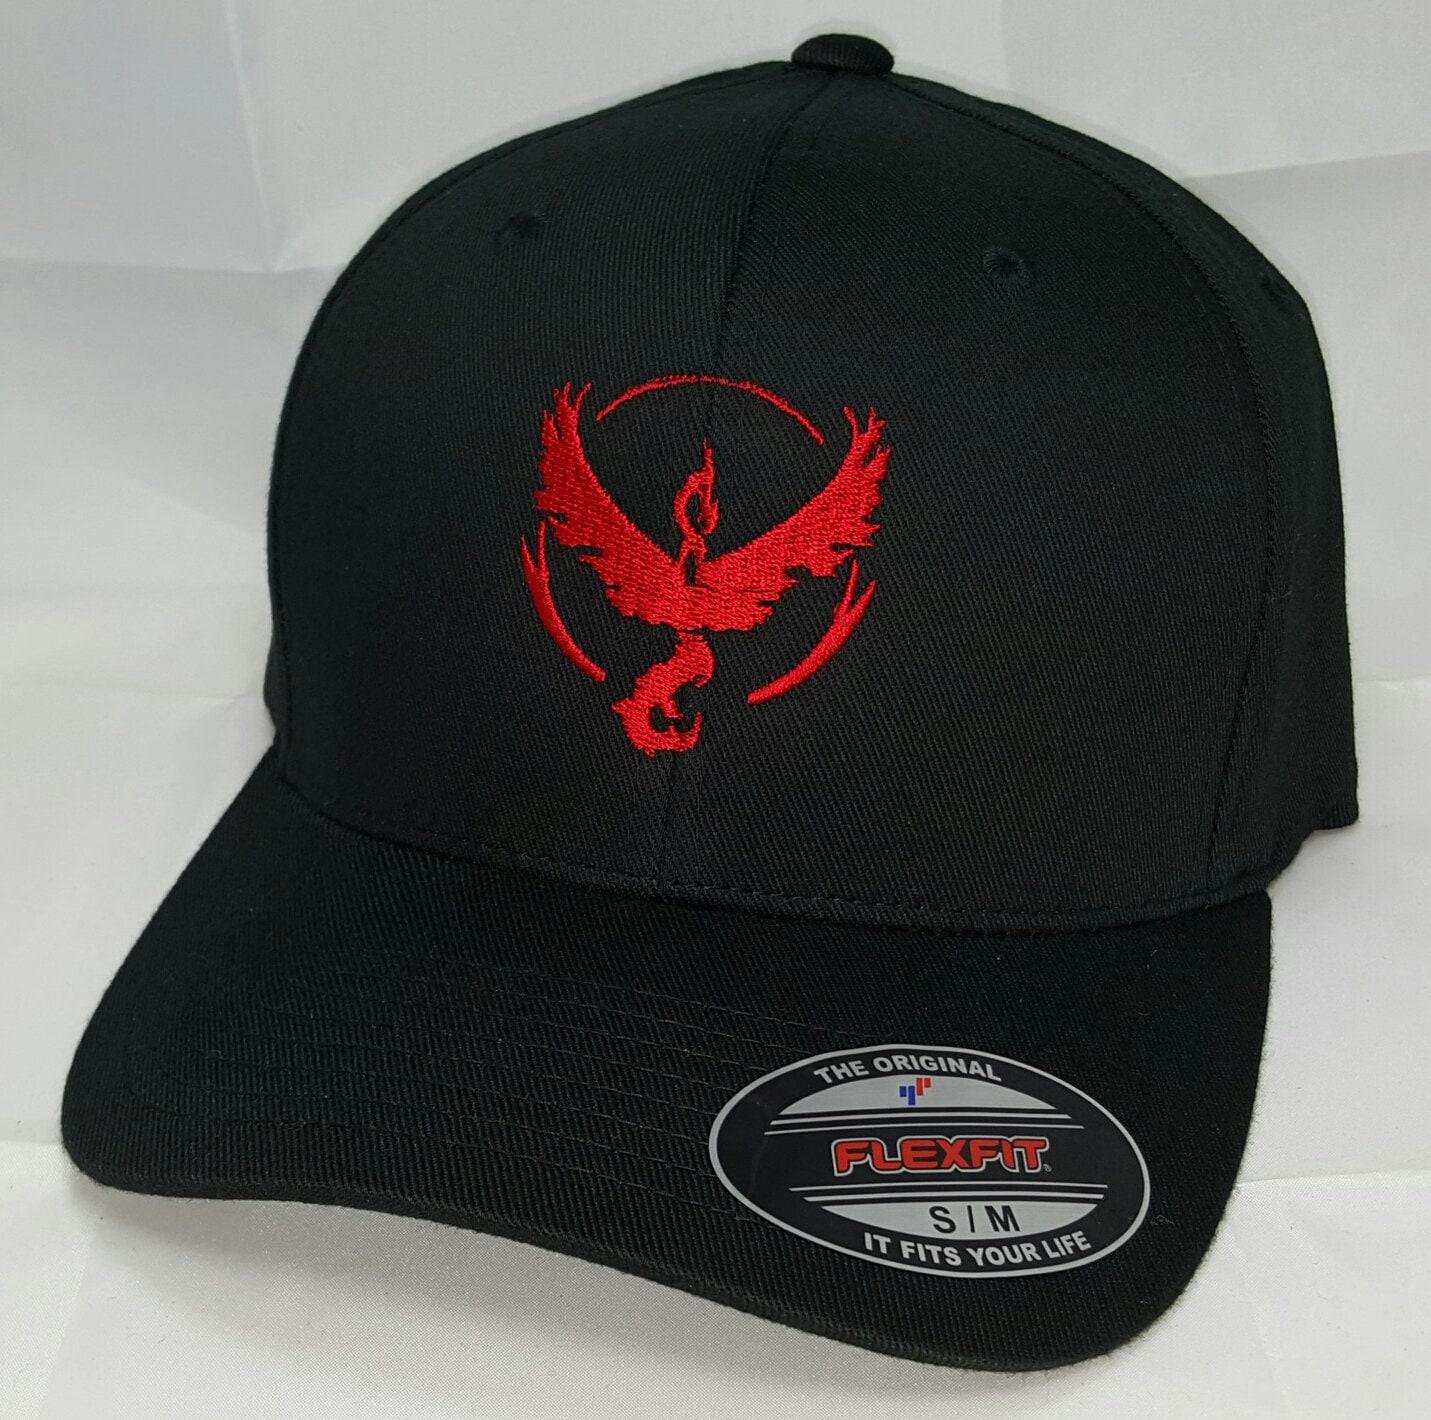 9c17508e Pokemon GO Team Valor Embroidered FLEXFIT Baseball Hat / Black Hat Flexfit  S/M or L/XL Baseball Cap